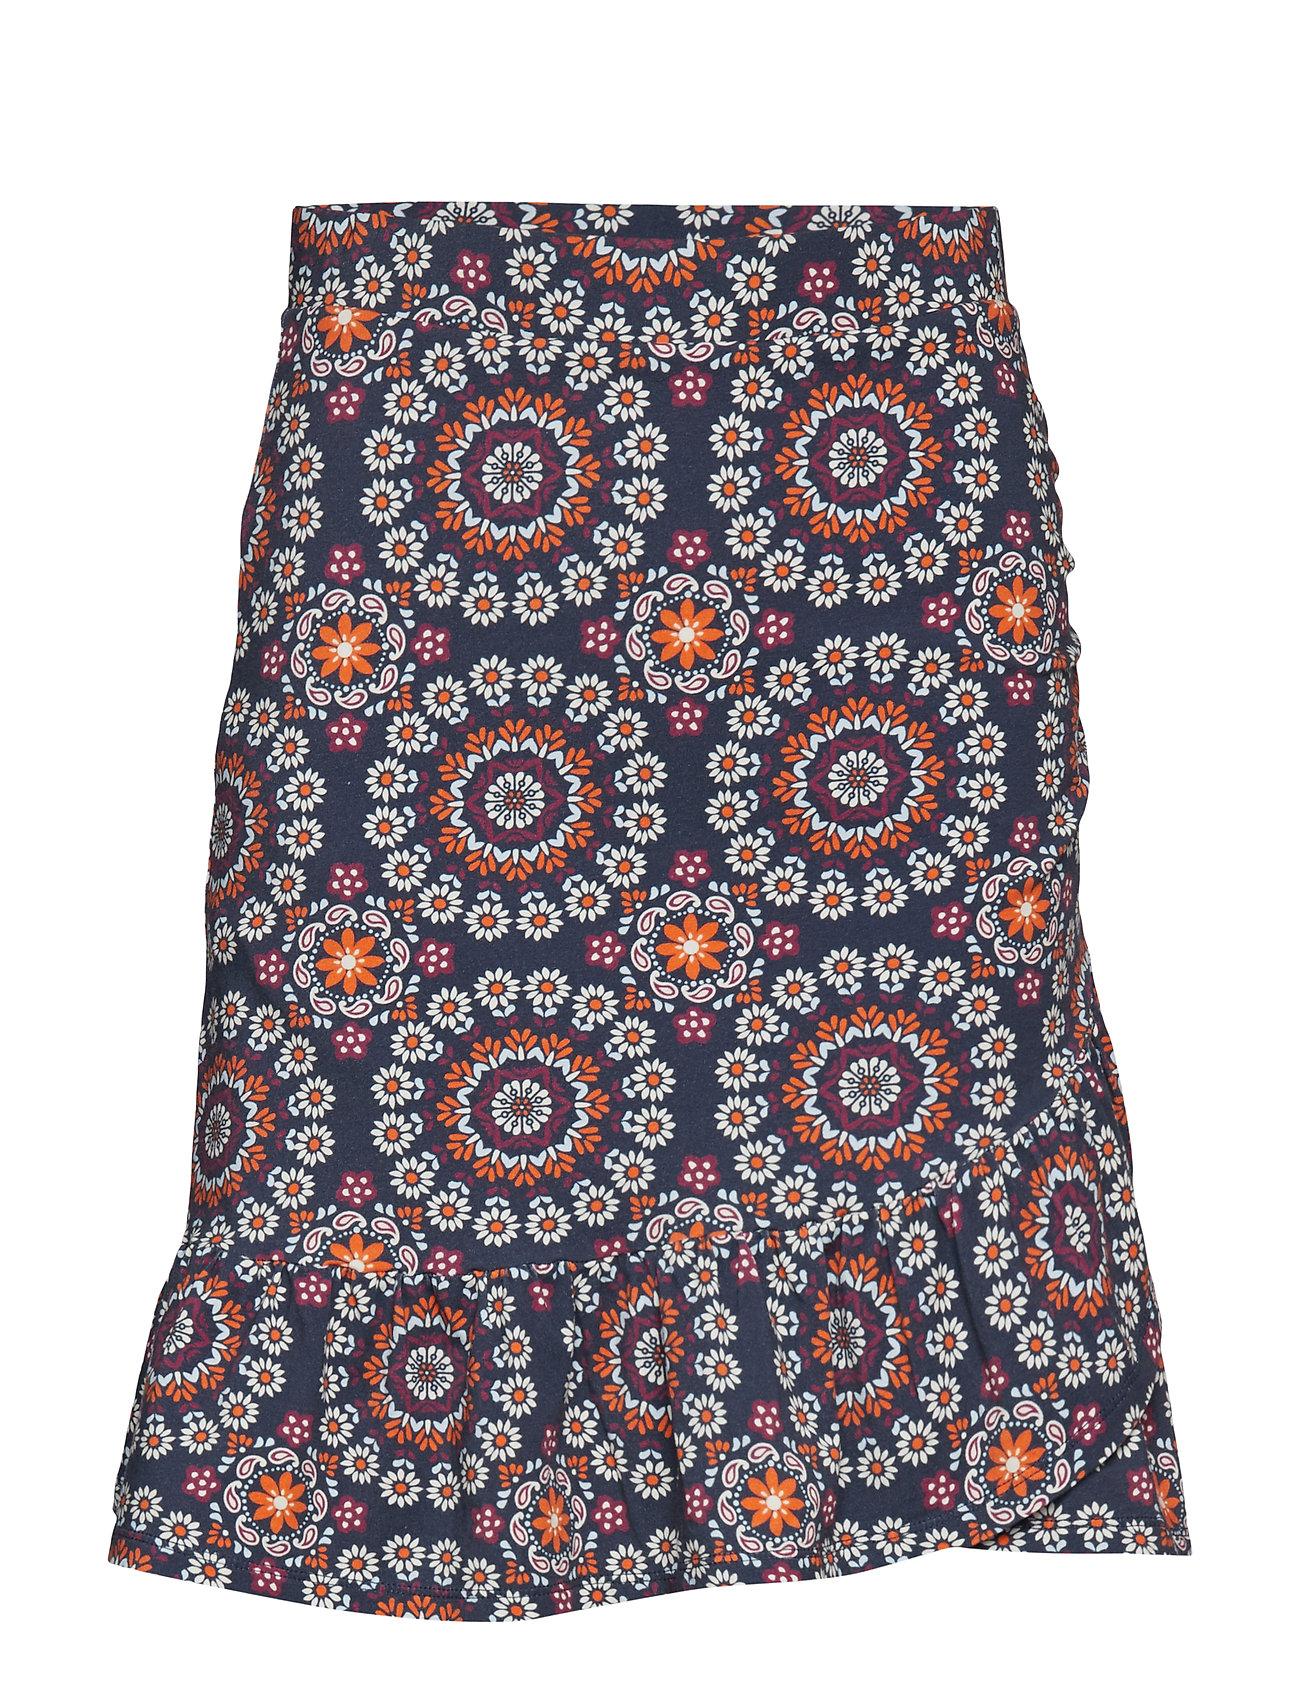 ODD MOLLY women empire skirt - DARK BLUE